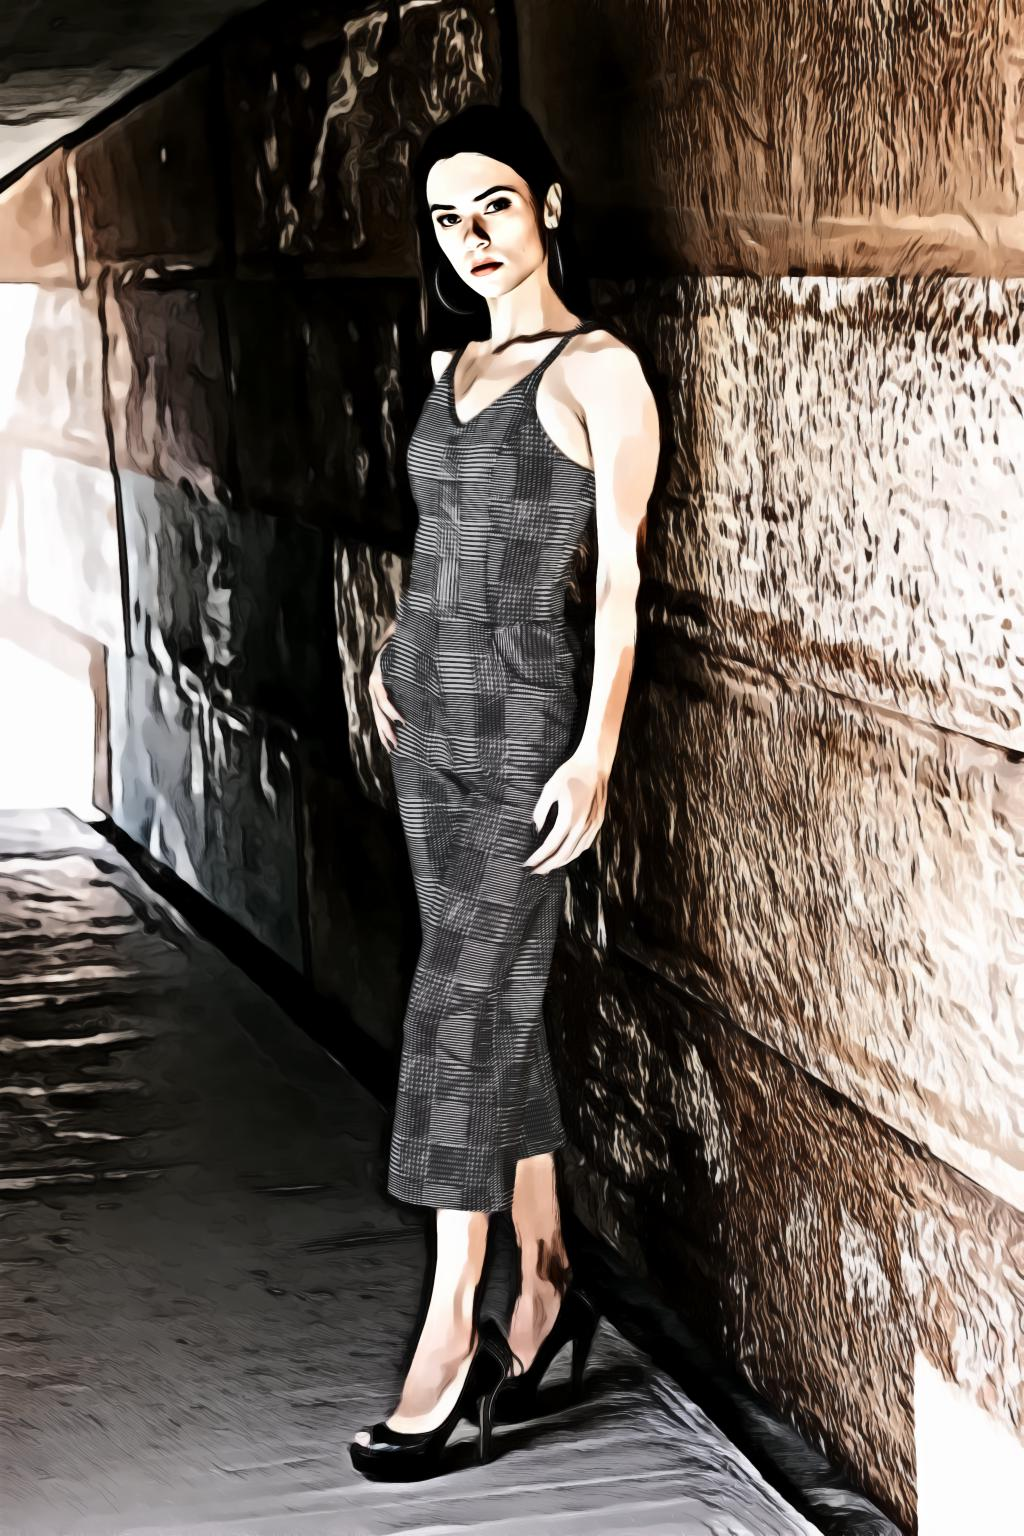 Woman wearing grey sleeveless dress standing near brown wall